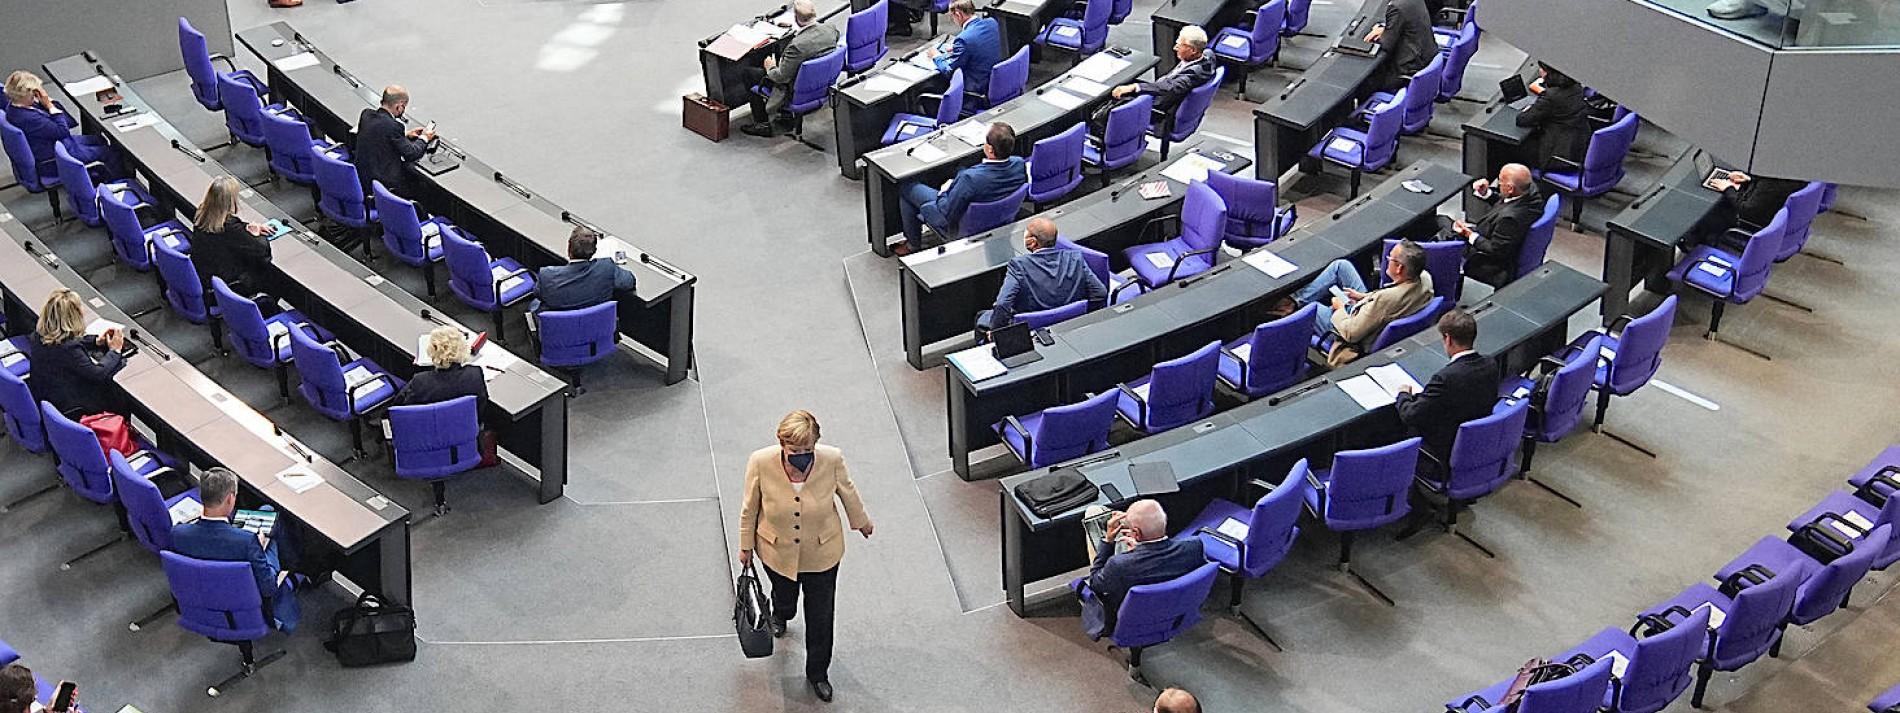 Der Bundestag als Wahlkampfbühne